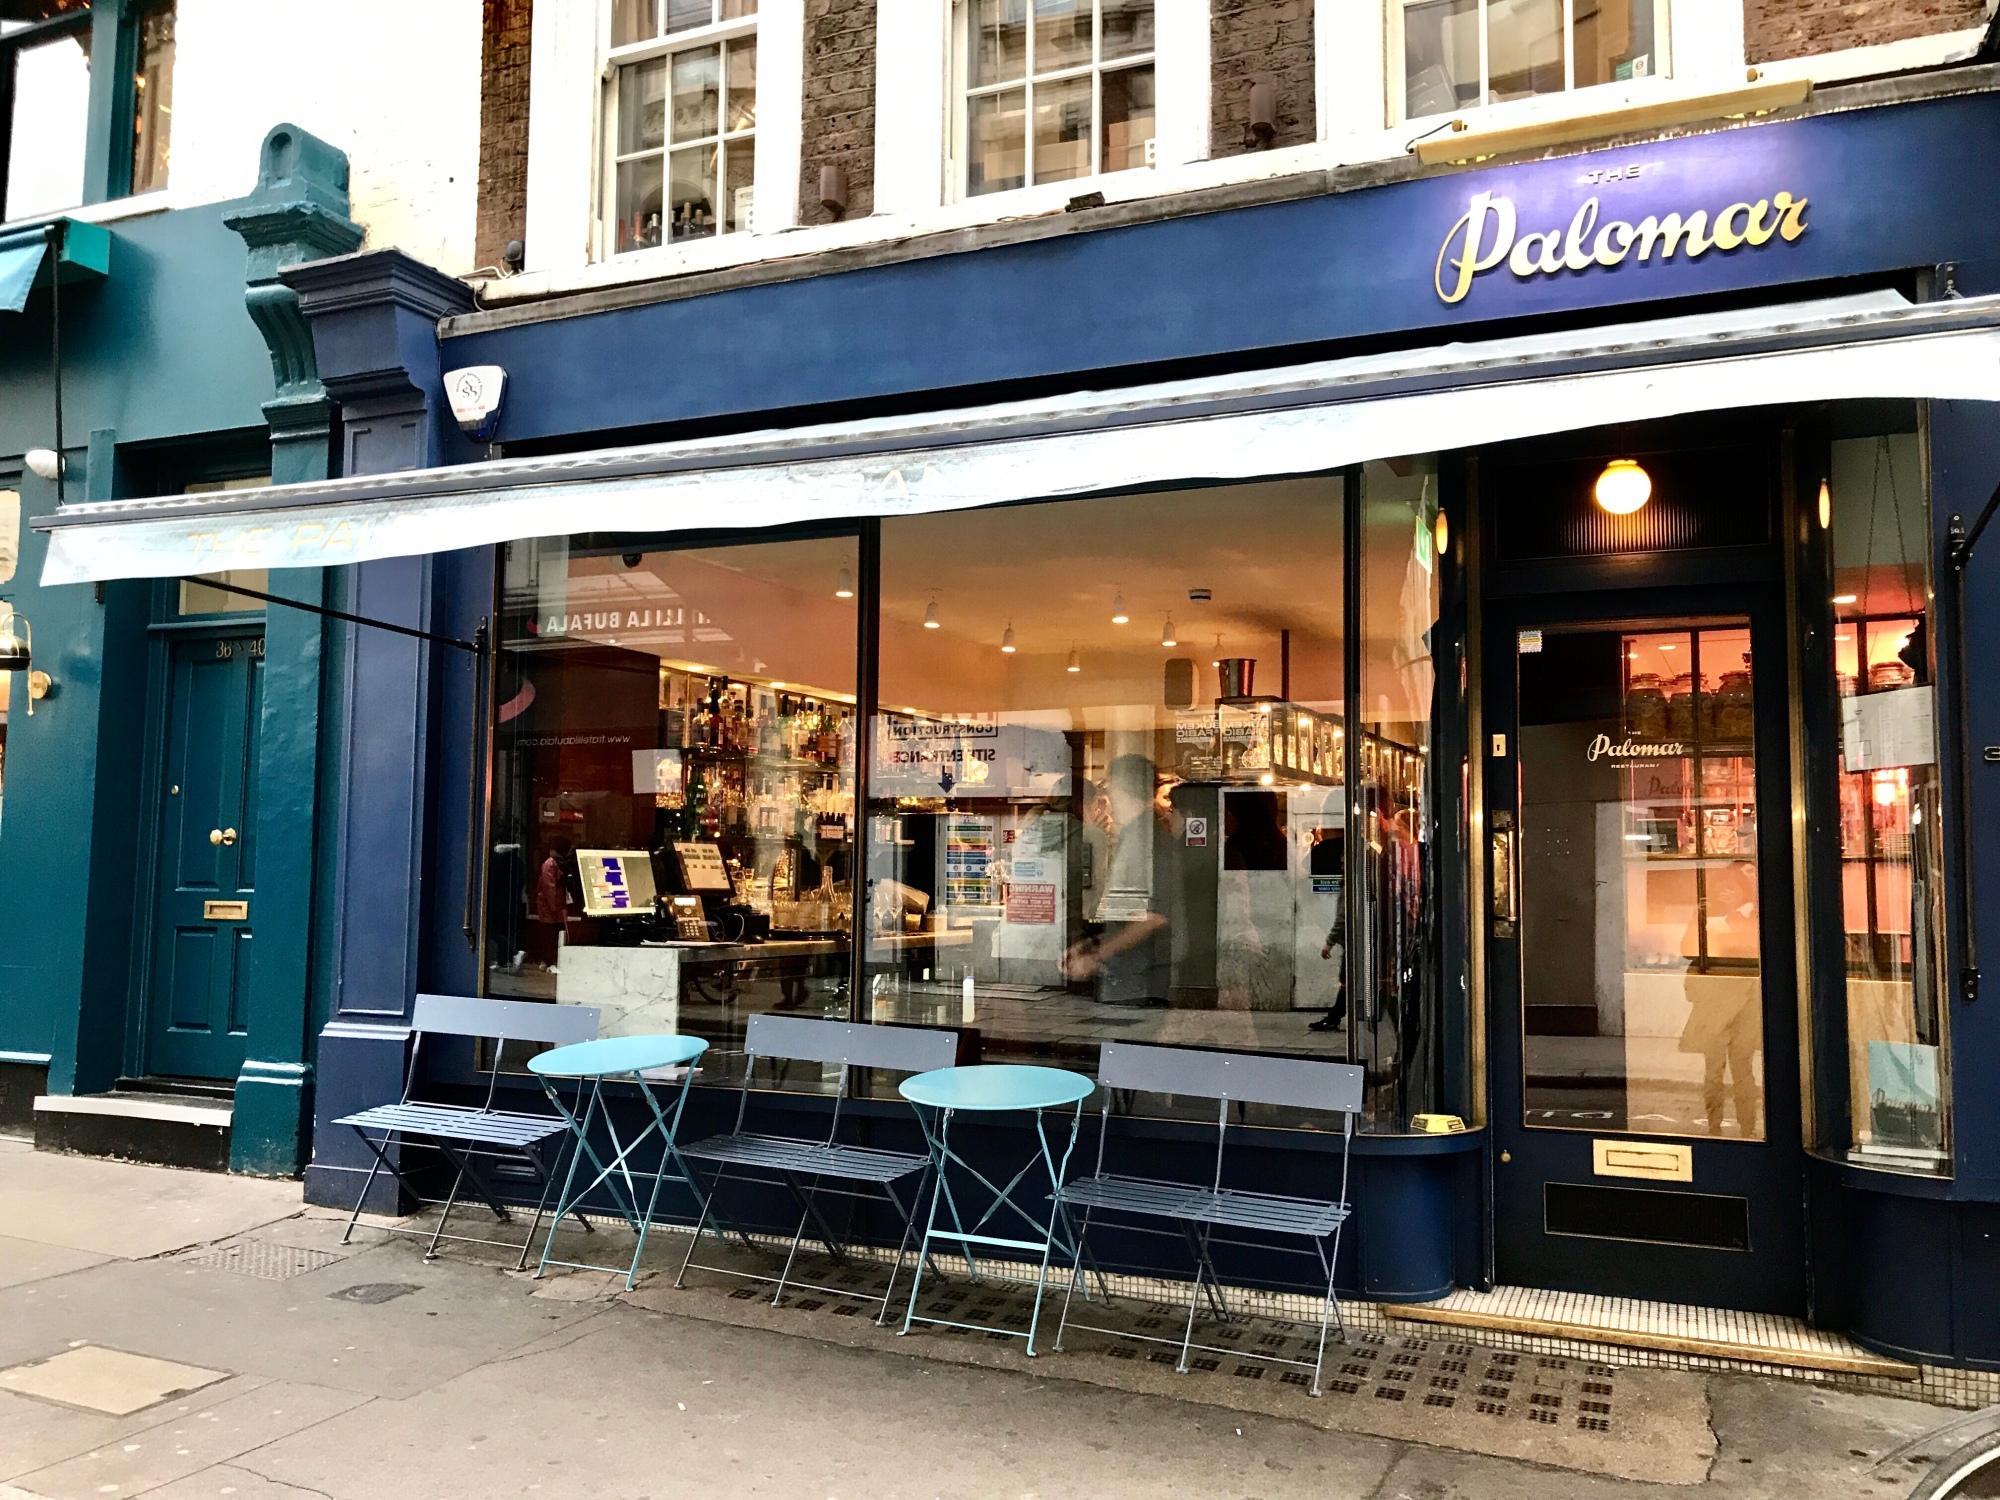 The Palomar, Soho London